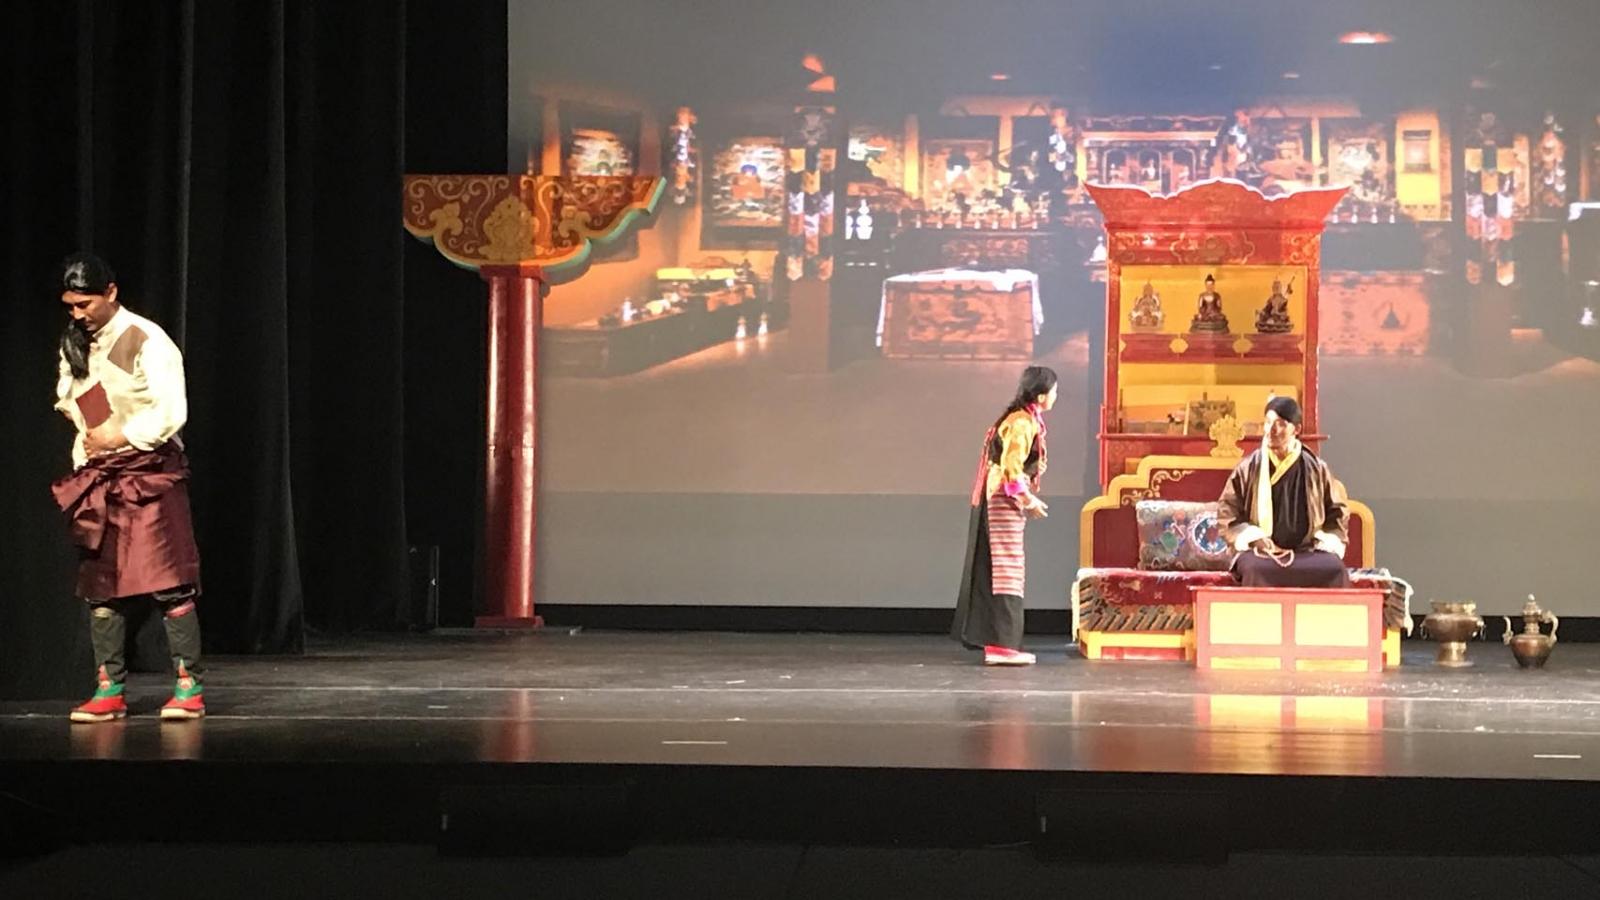 Laguardia Performing Arts Center Long Island City